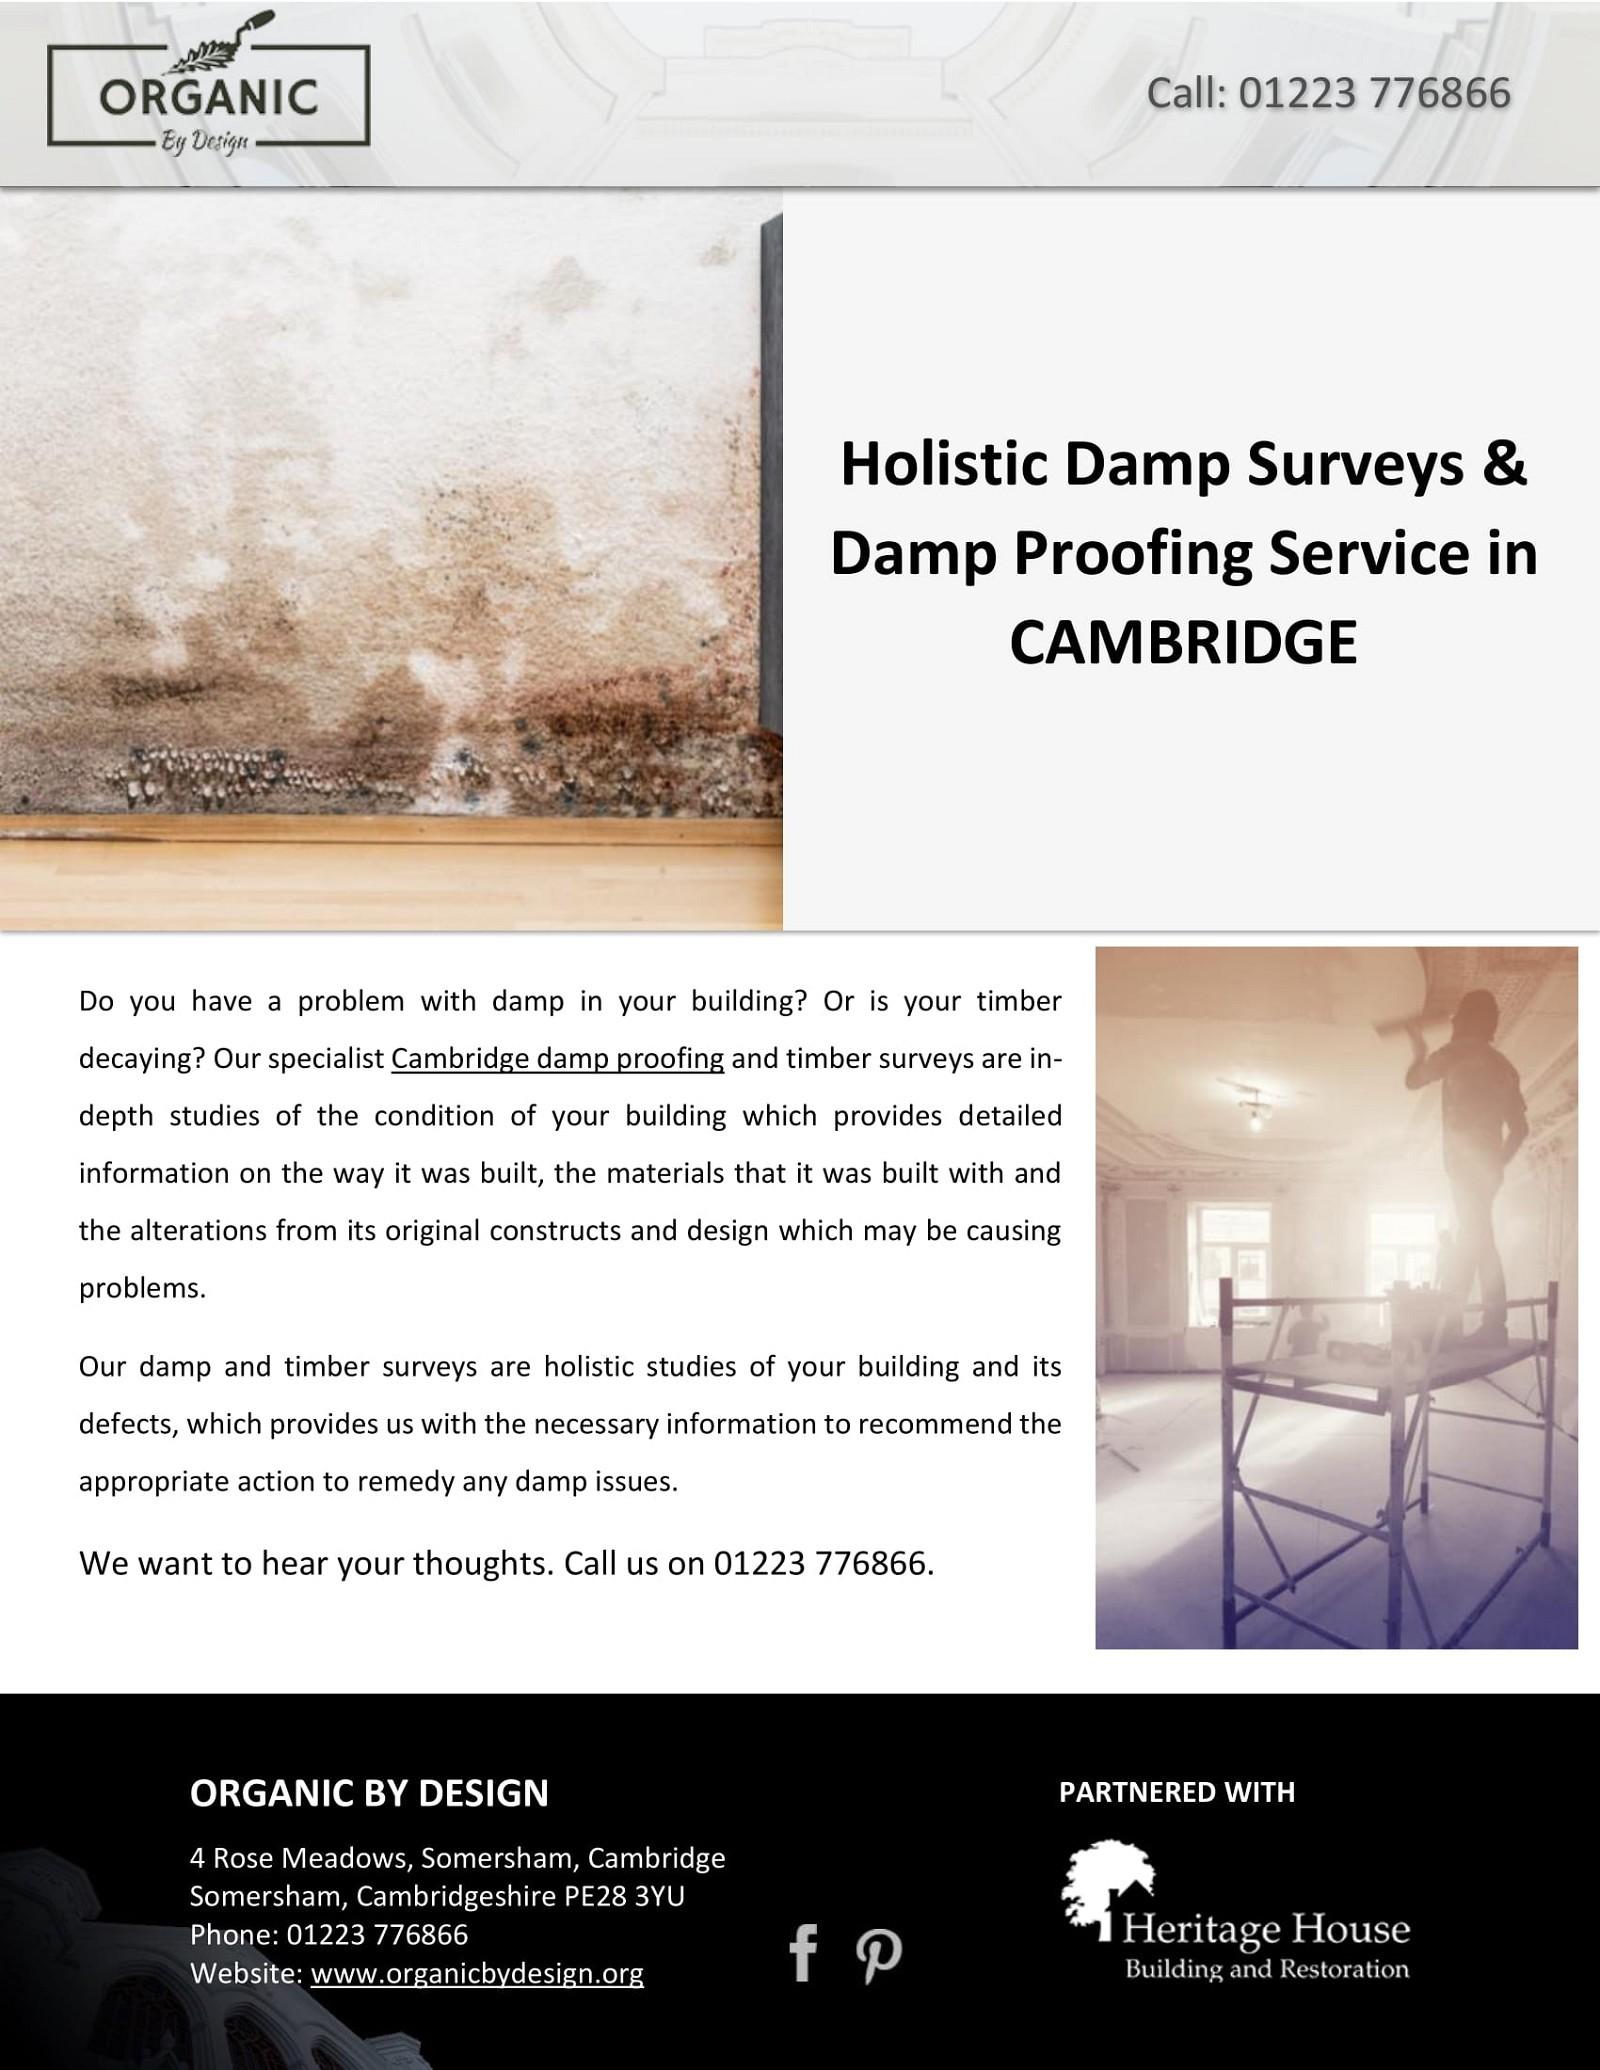 Holistic Damp Surveys & Damp Proofing Service in CAMBRIDGE